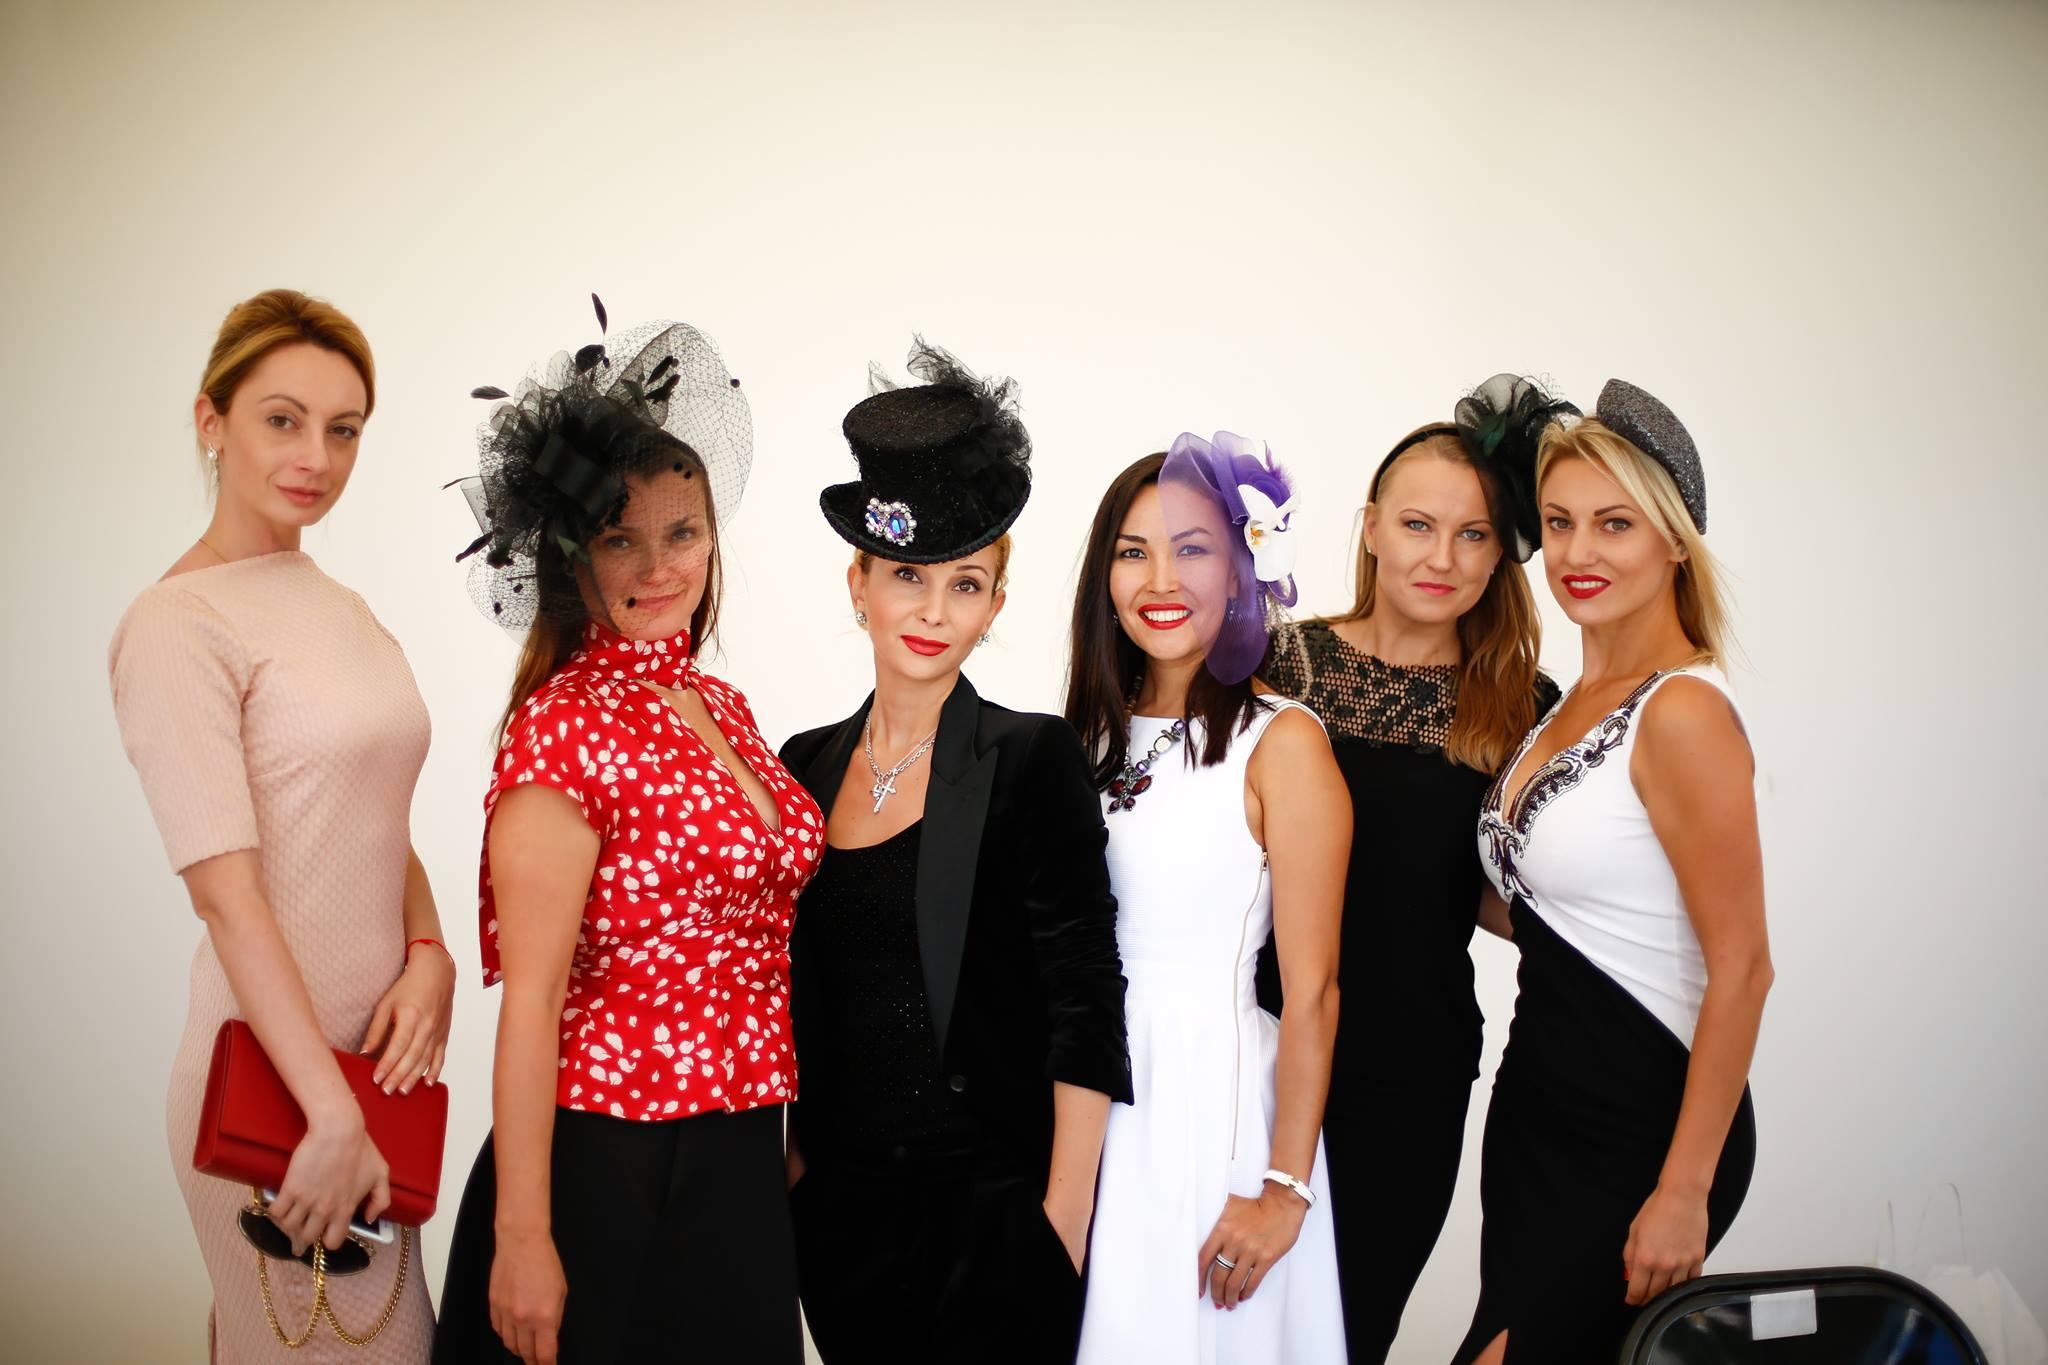 Конкурс женских шляпок